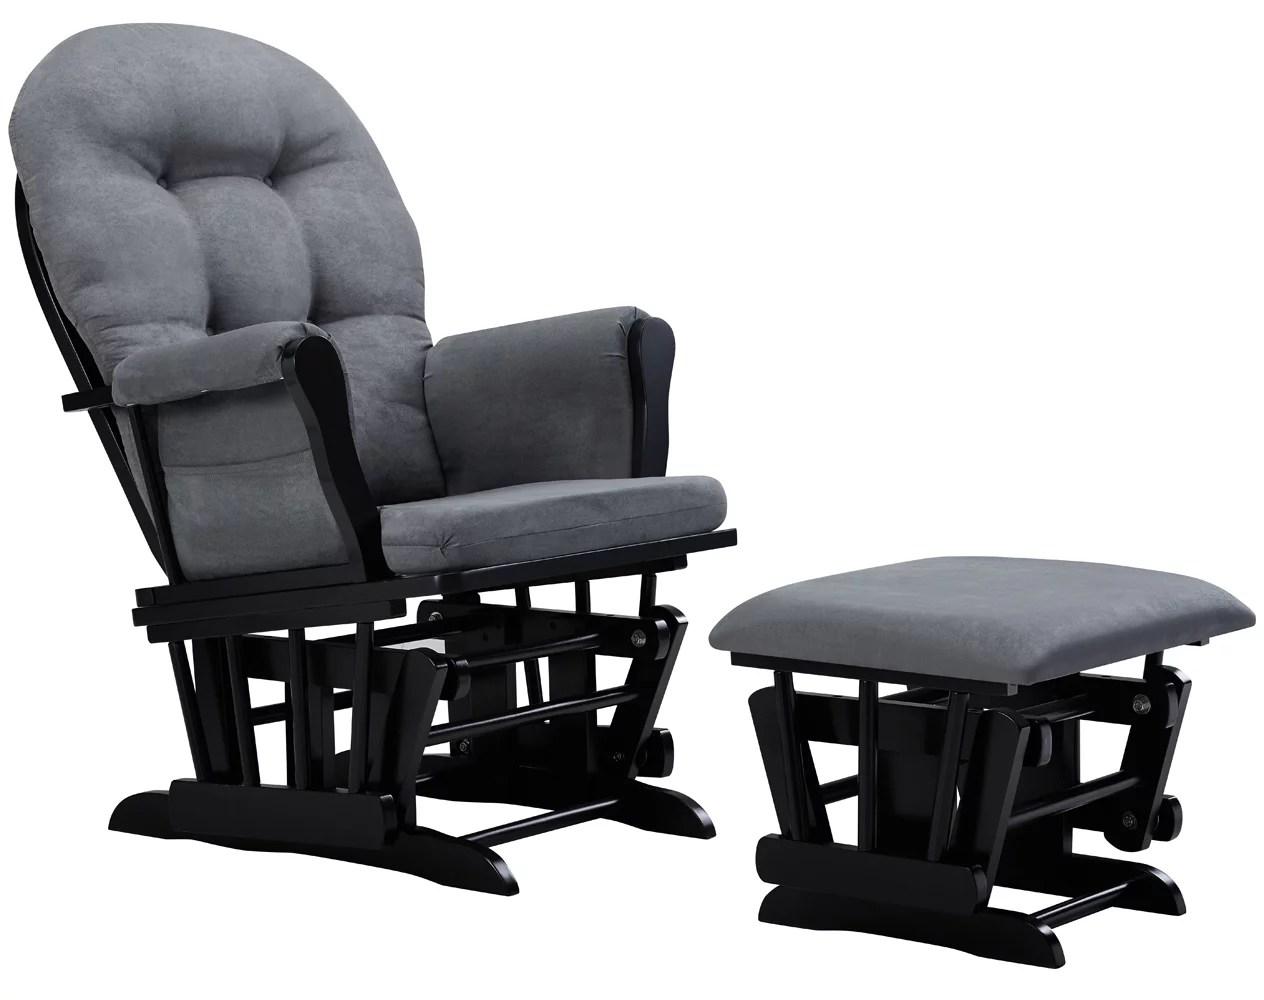 Glider Chair And Ottoman Nursery Rocking Furniture Baby Nursing Rocker Seat Gray  eBay